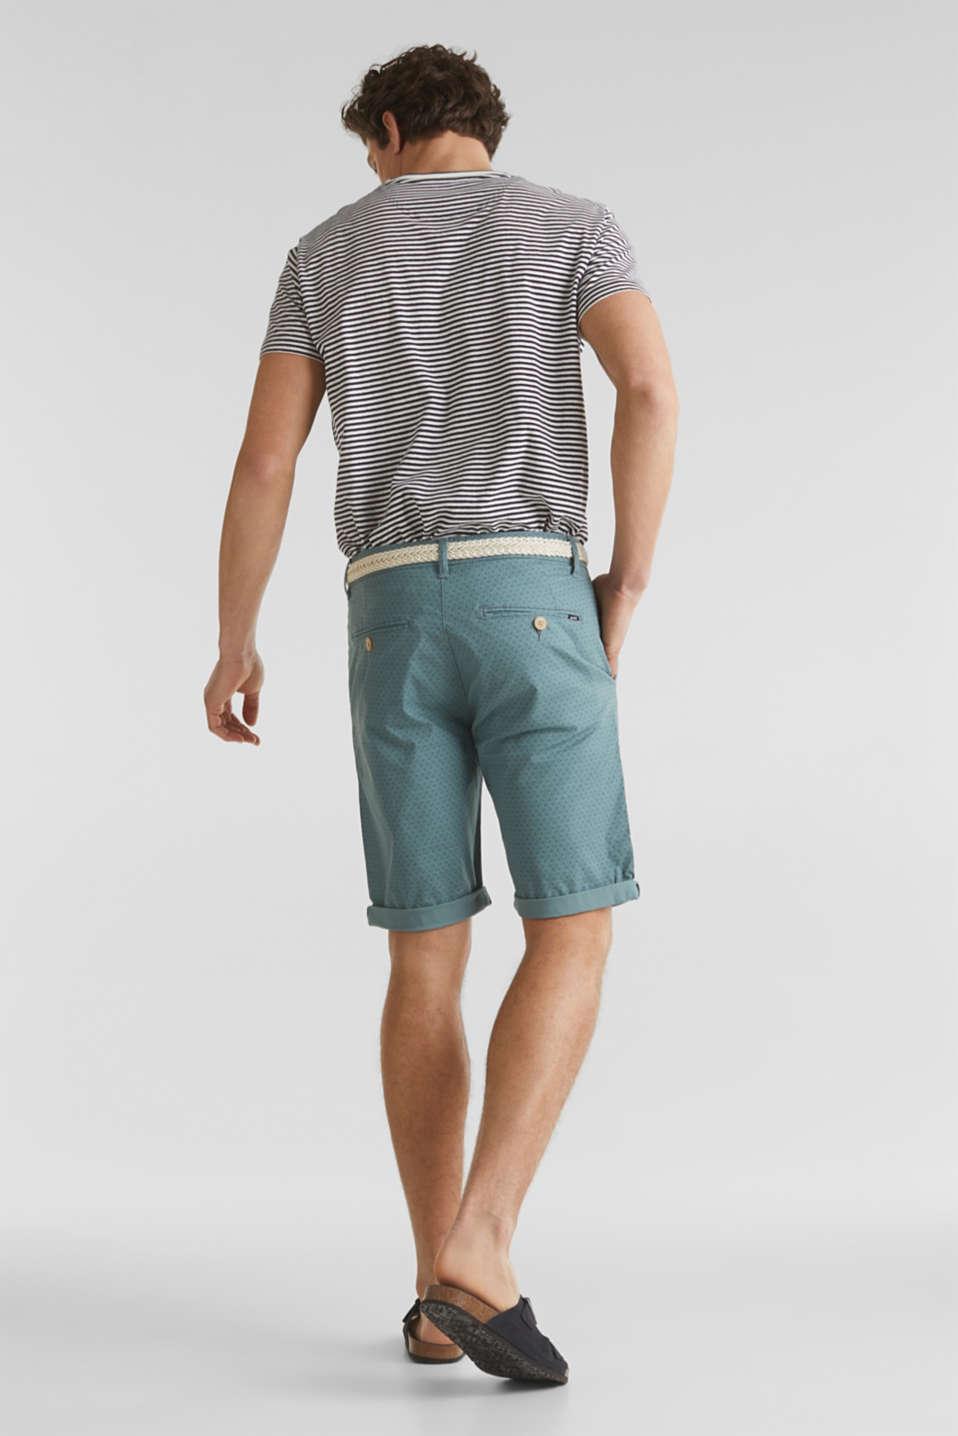 Organic cotton Shorts + belt, TEAL GREEN, detail image number 6